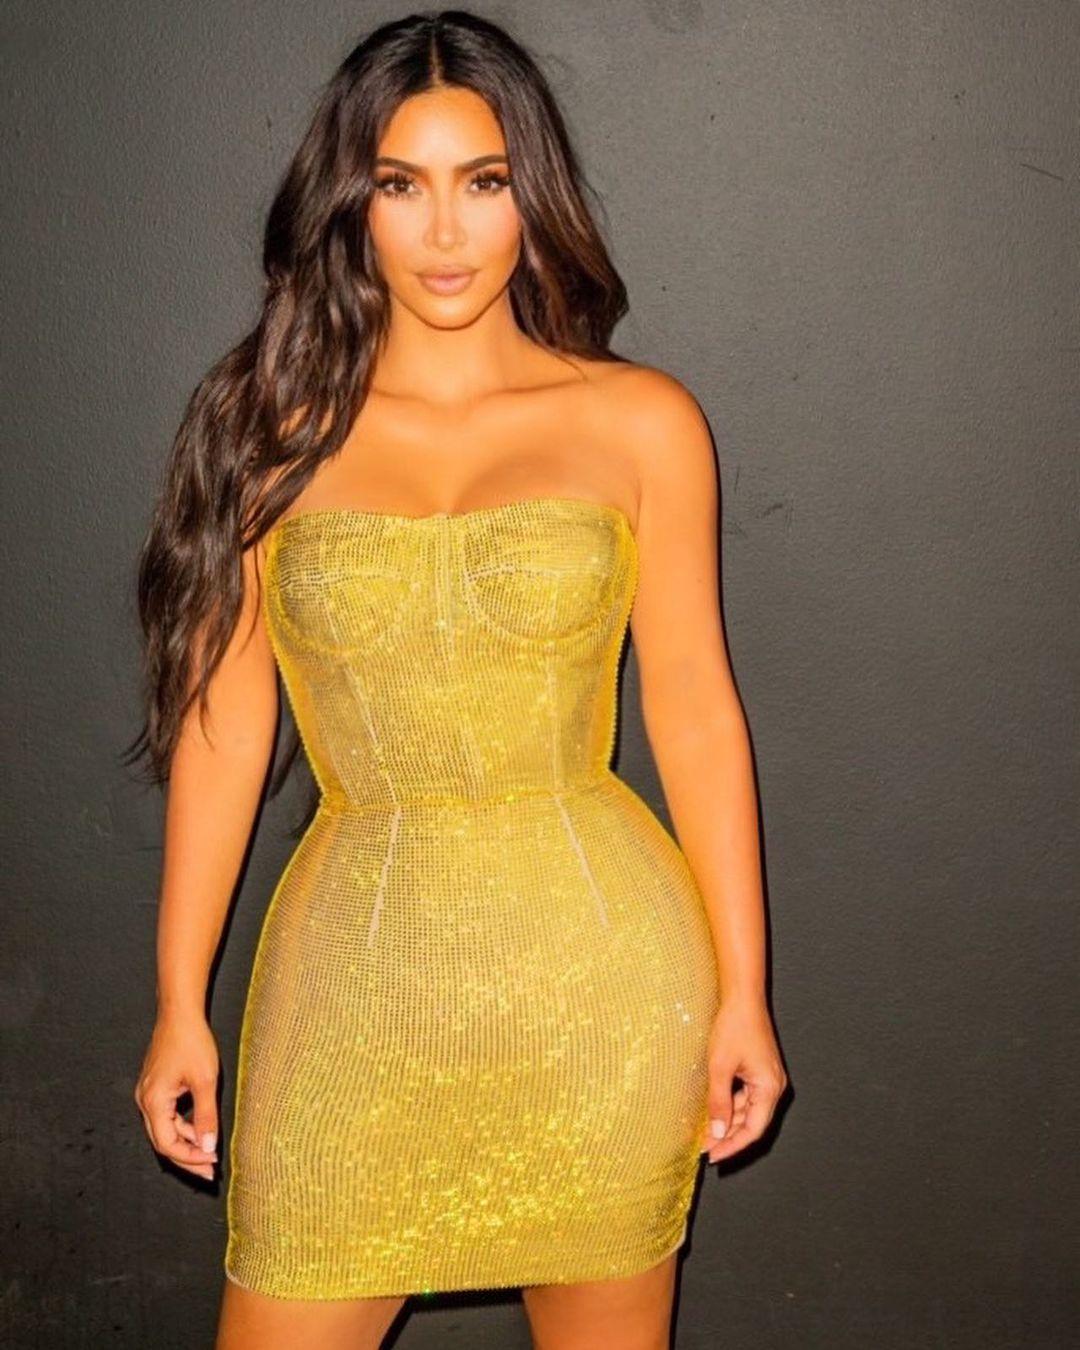 9 Potret Seksi Kim Kardashian West di Tahun 2020, Makin 'Nongol'!